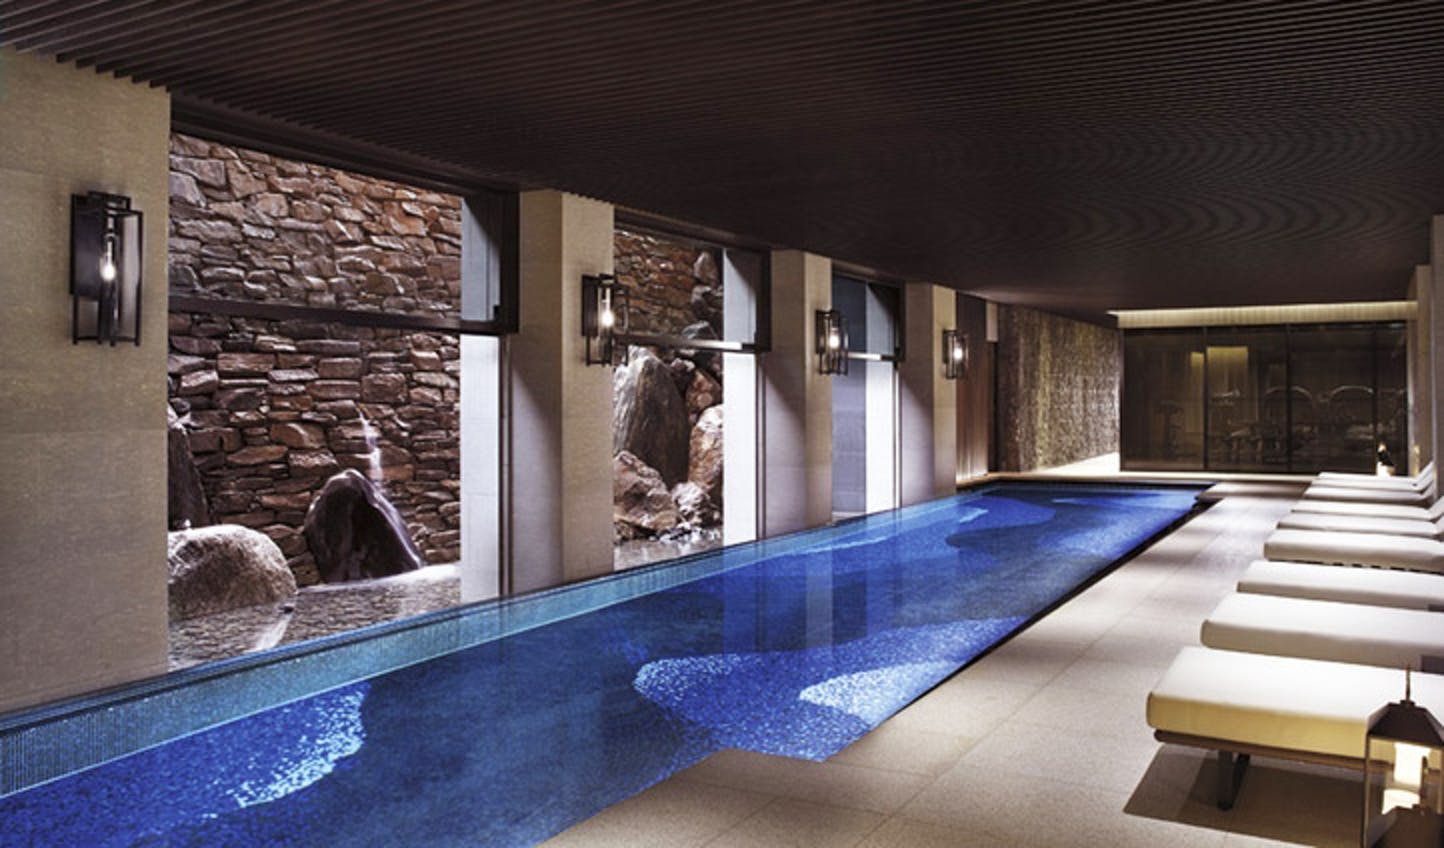 The pool at the Ritz-Carlton, Kyoto